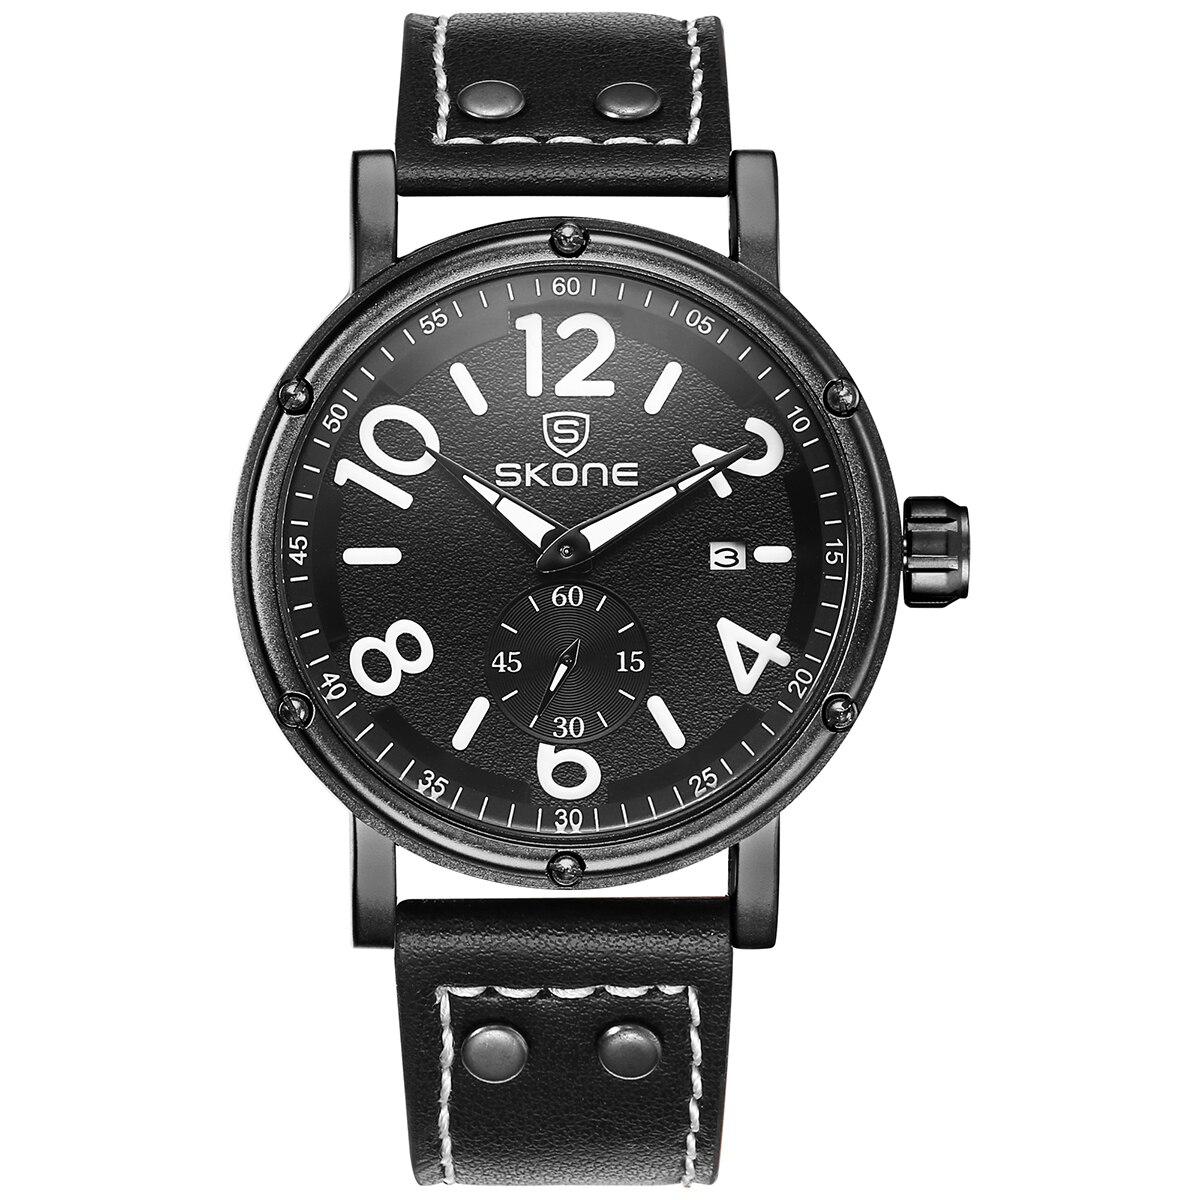 цена SKONE Classic Leather Men Wristwatch Independent Small Seconds Dial Calendar Display Quartz Movement Buckle Fashion Men Watch онлайн в 2017 году